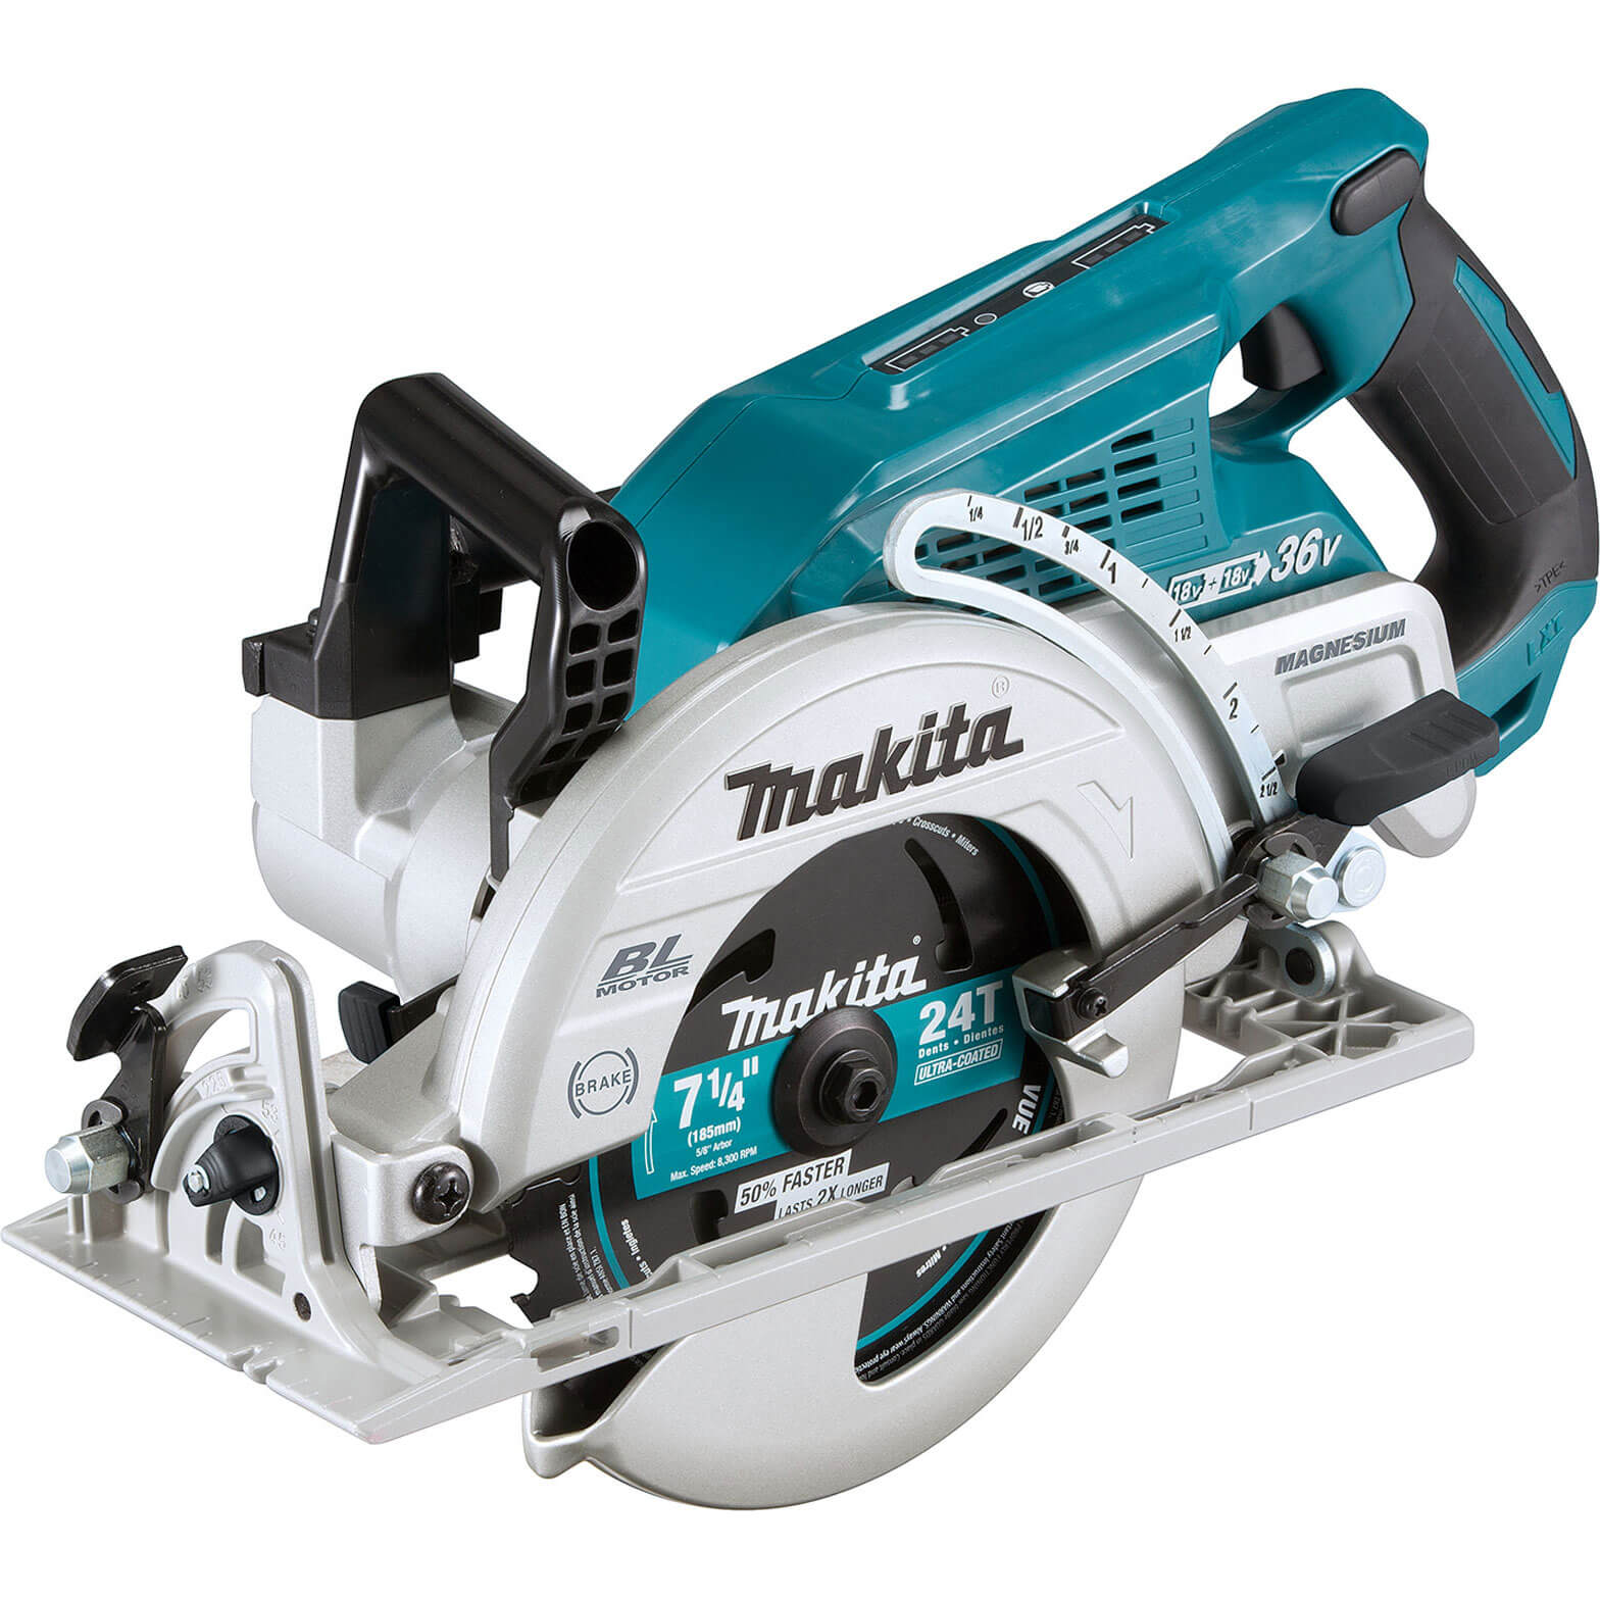 Image of Makita DRS780 Twin 18v LXT Cordless Brushless Circular Saw 185mm No Batteries No Charger No Case